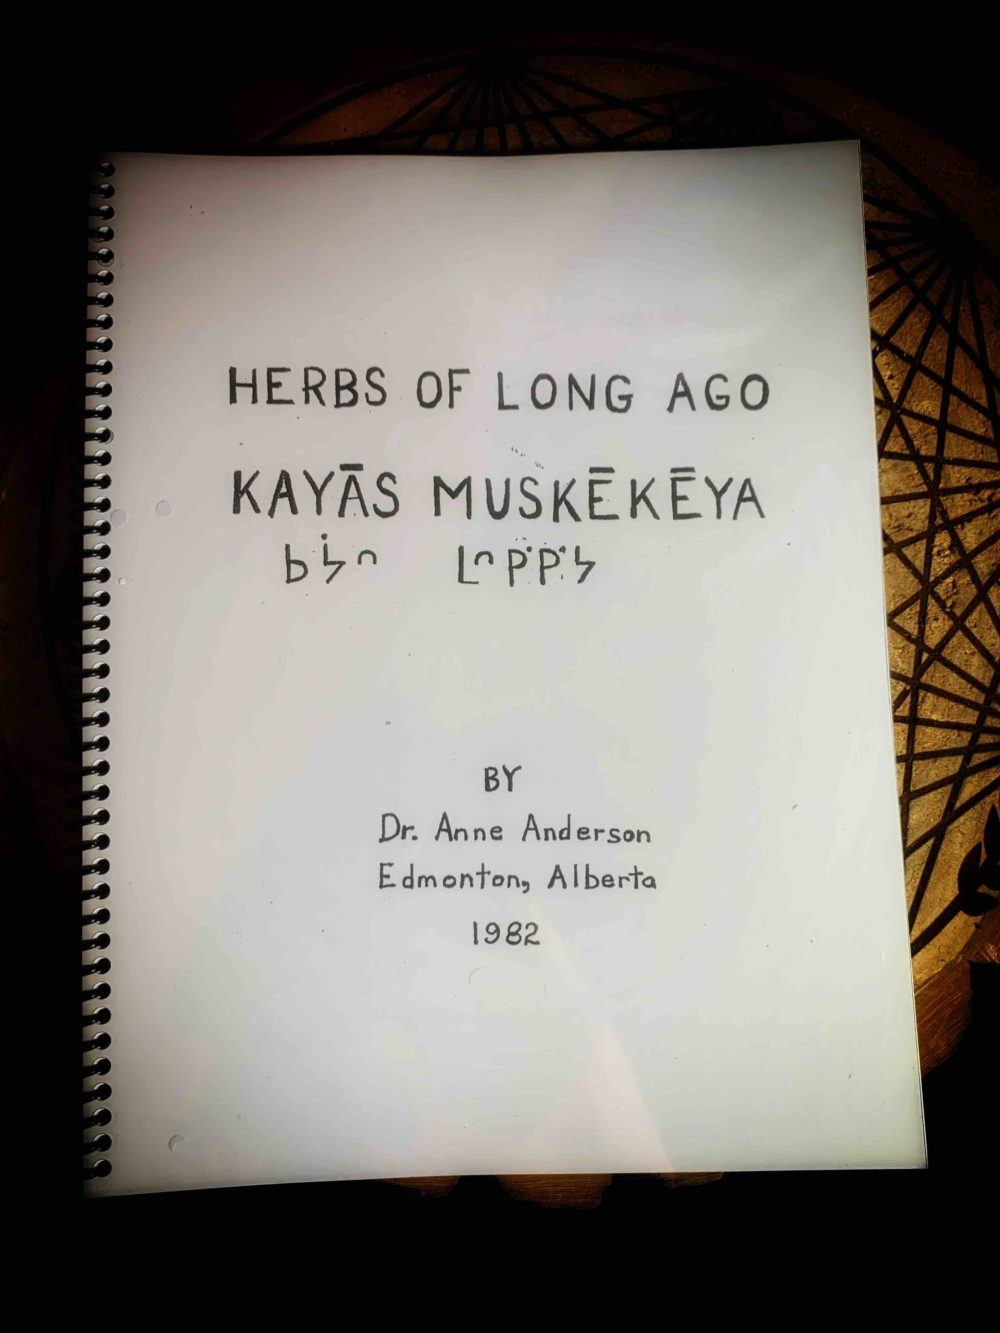 Herbs of Long Ago Kayas Muskekeya